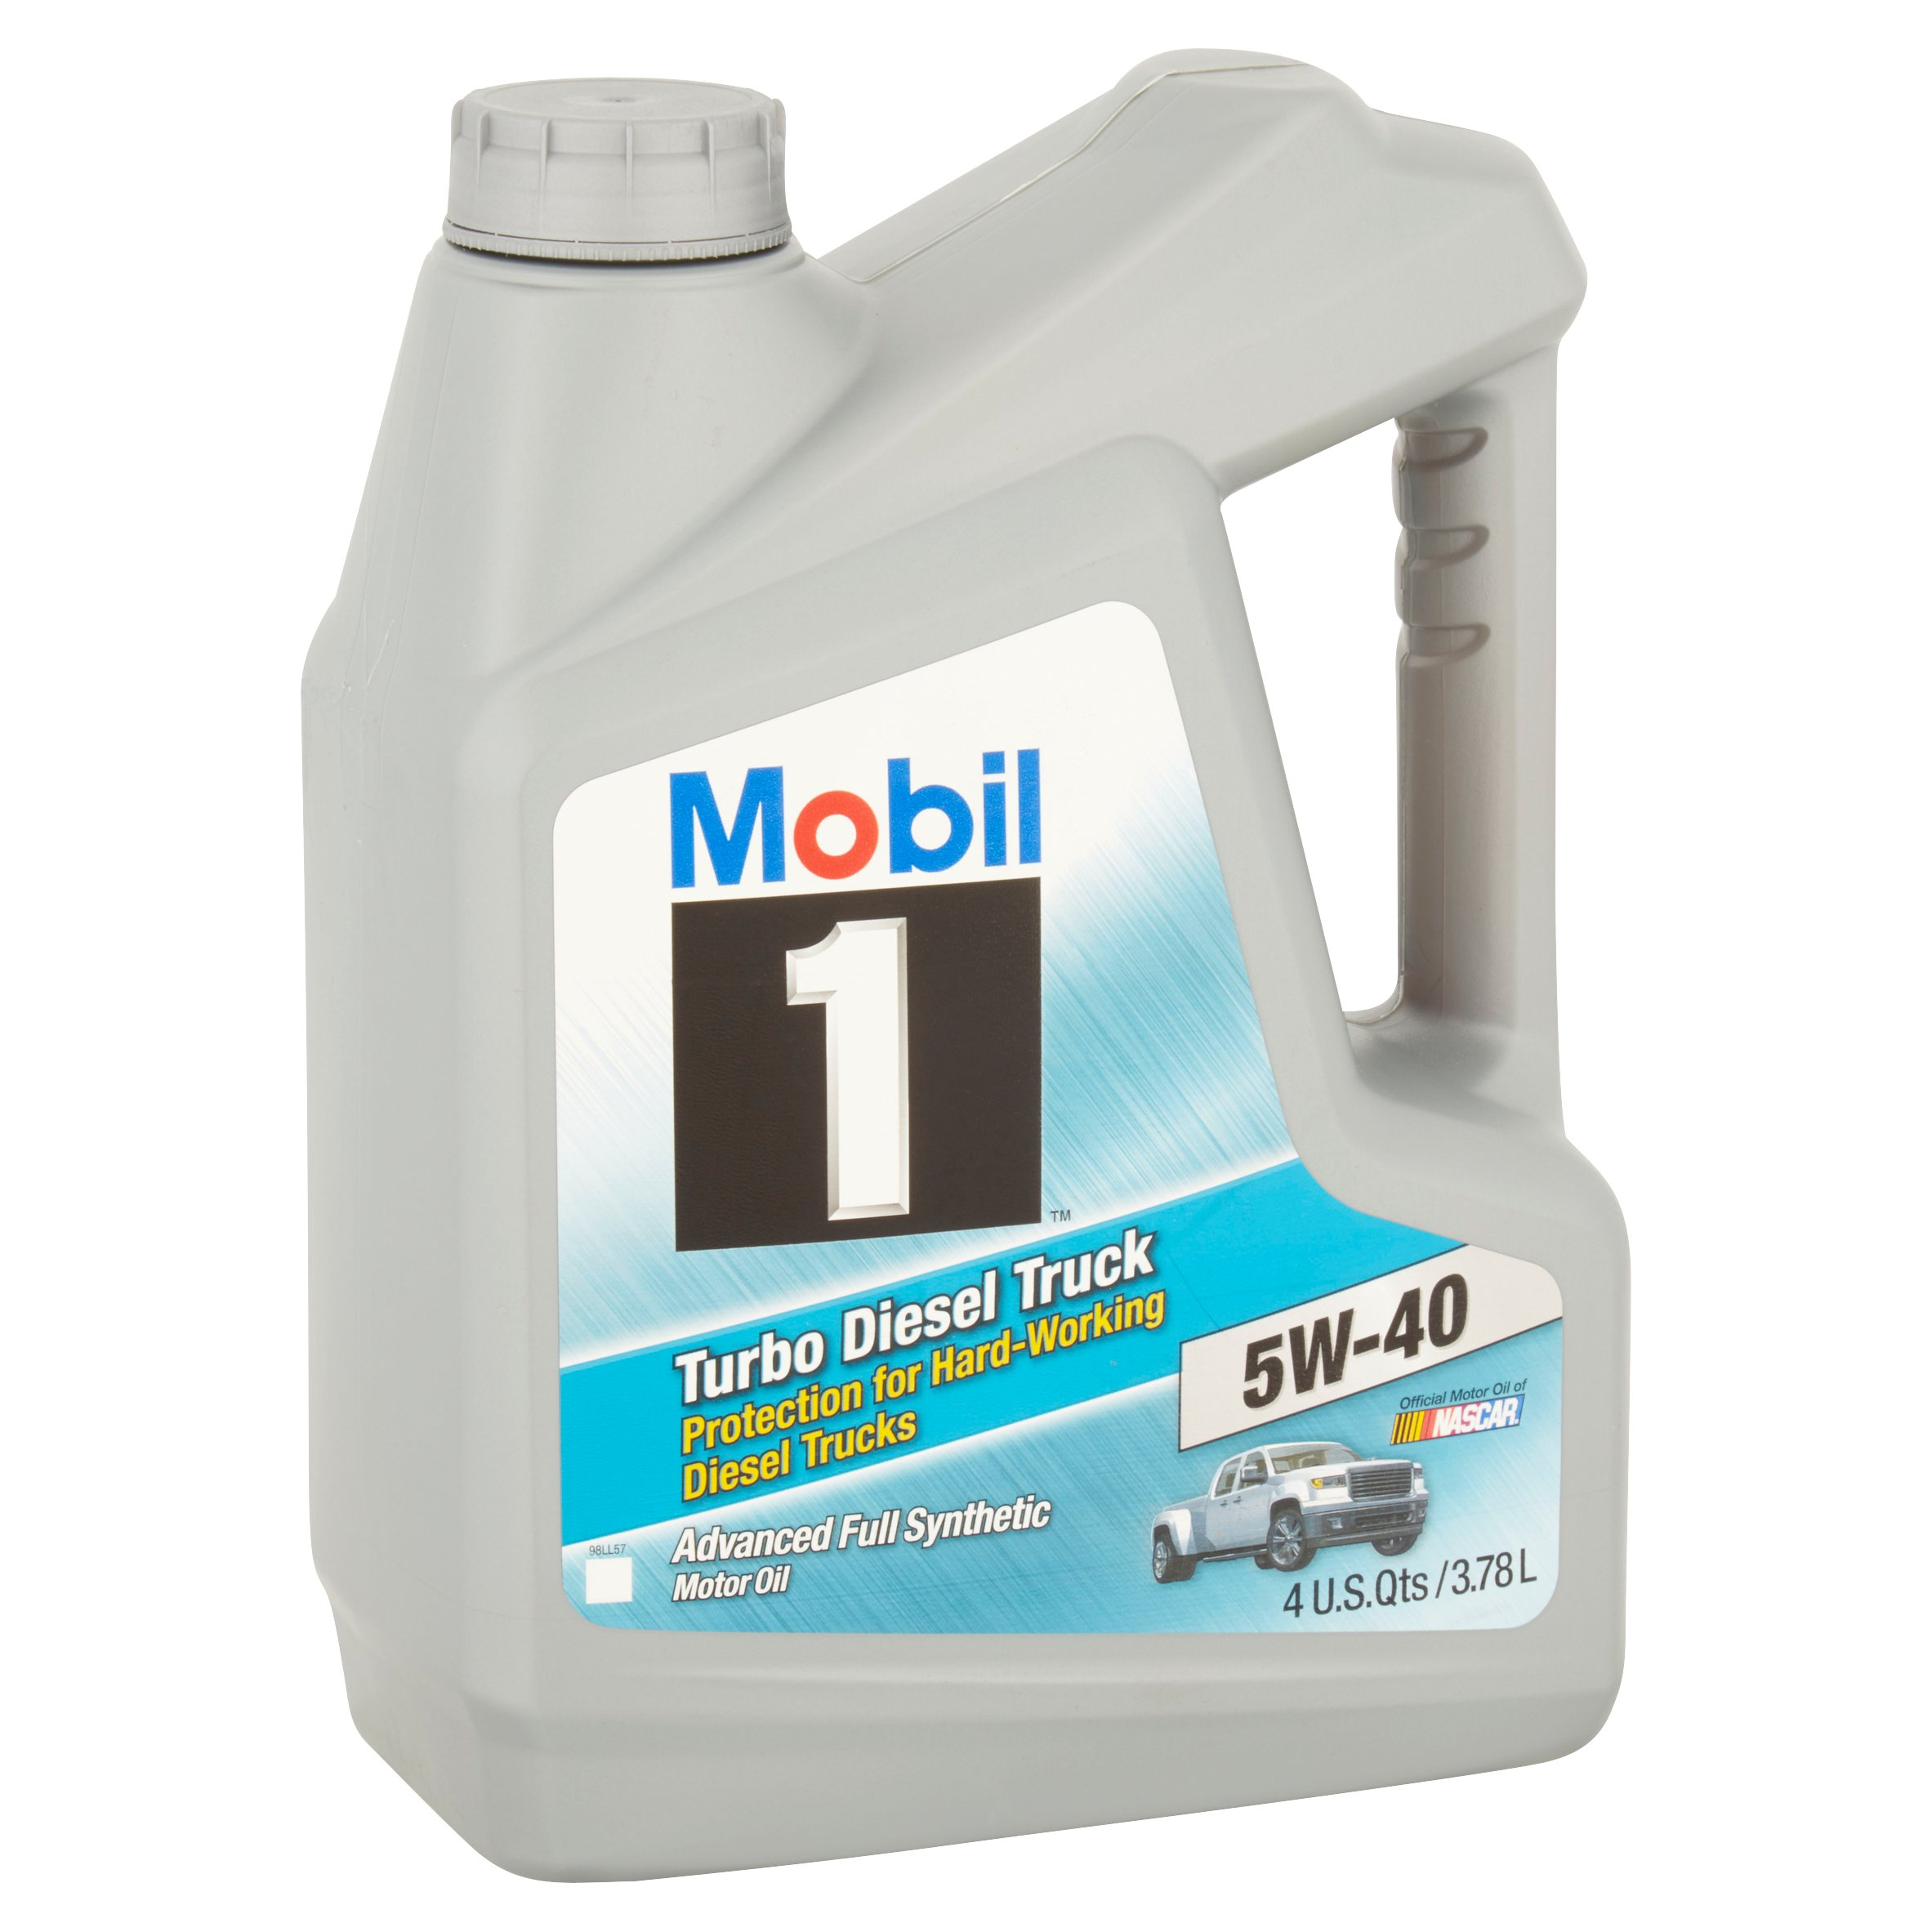 3 mobil 1 5w 40 turbo diesel truck motor oil 1 gal full. Black Bedroom Furniture Sets. Home Design Ideas